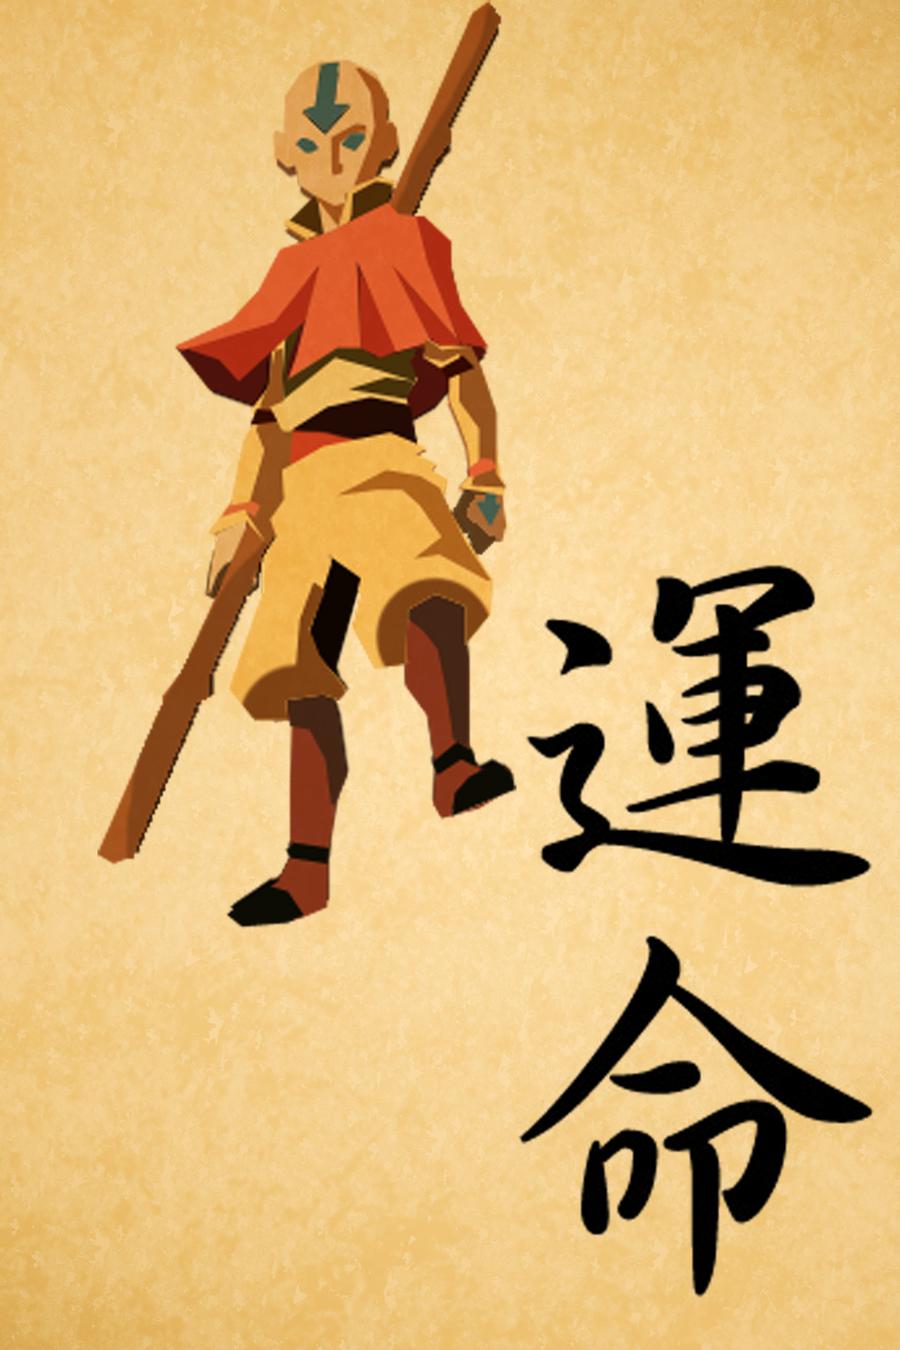 Aang - Destiny by DaveBaldwin3D